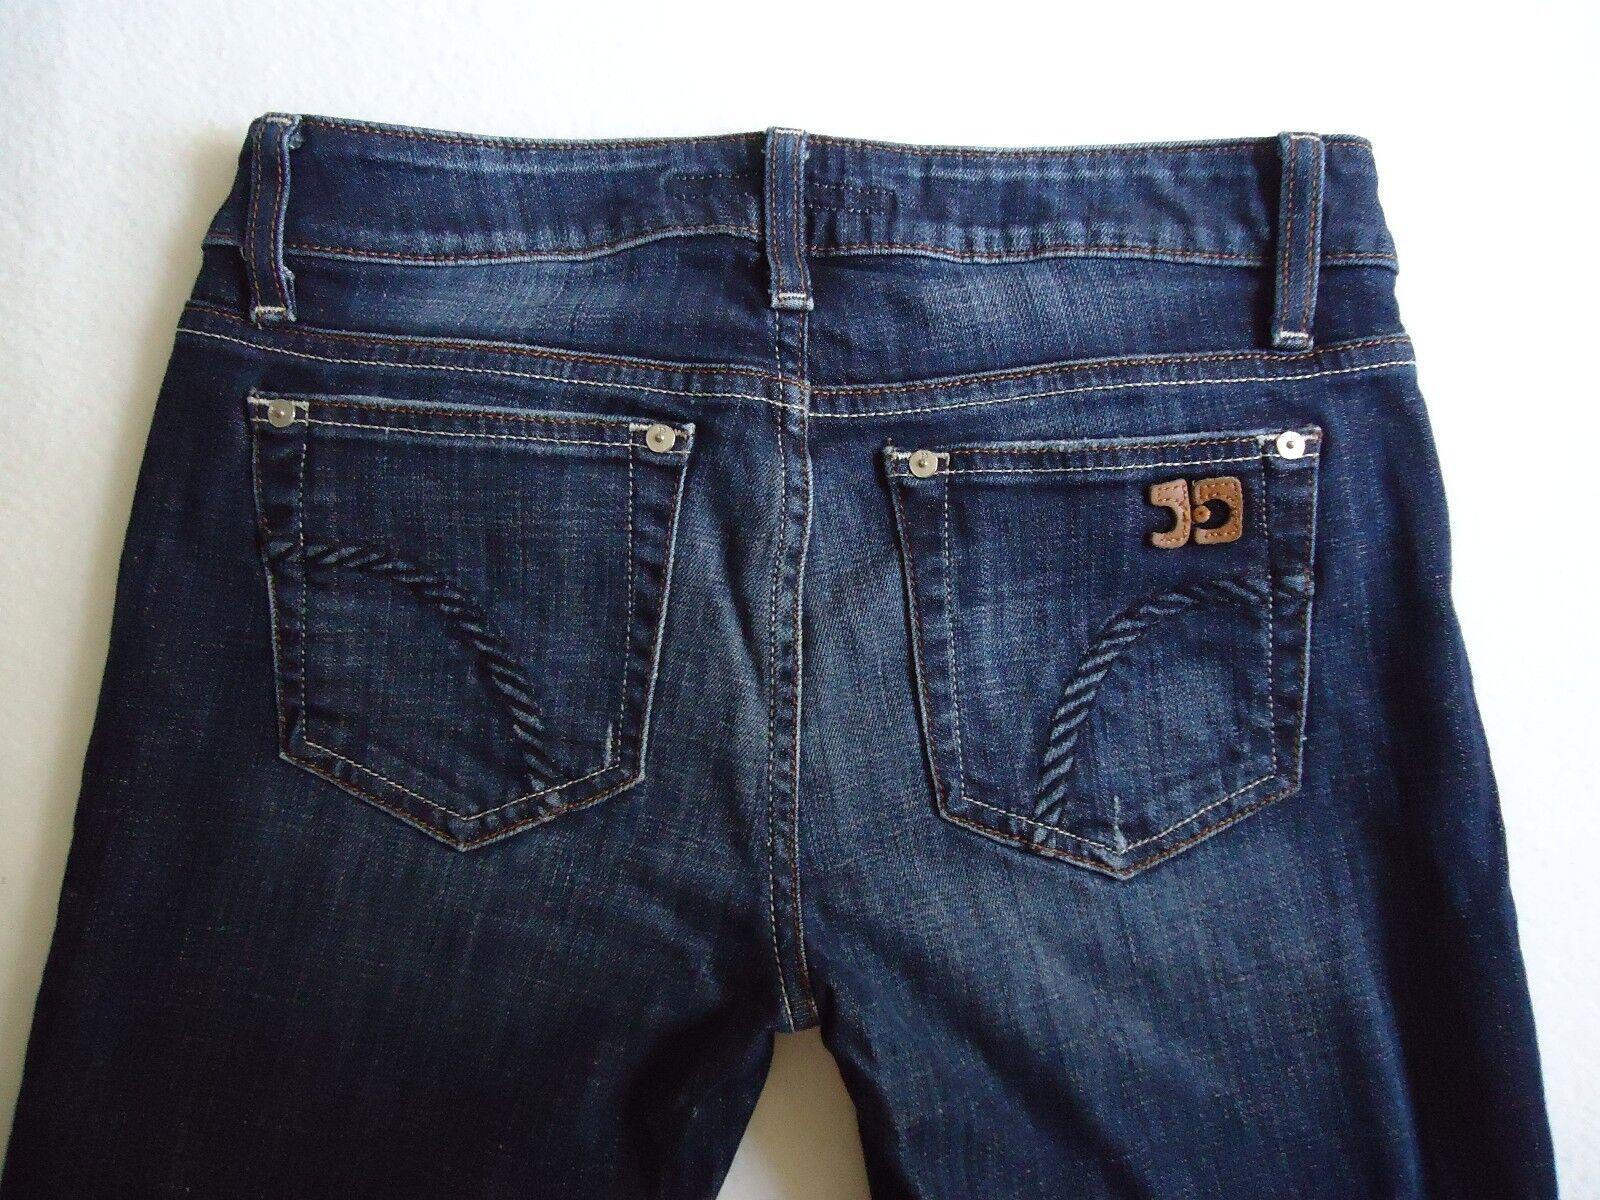 Joe's Jeans 27 x 29.5 The Honey Bootcut Ryder Wash Low Rise Denim bluee Jean